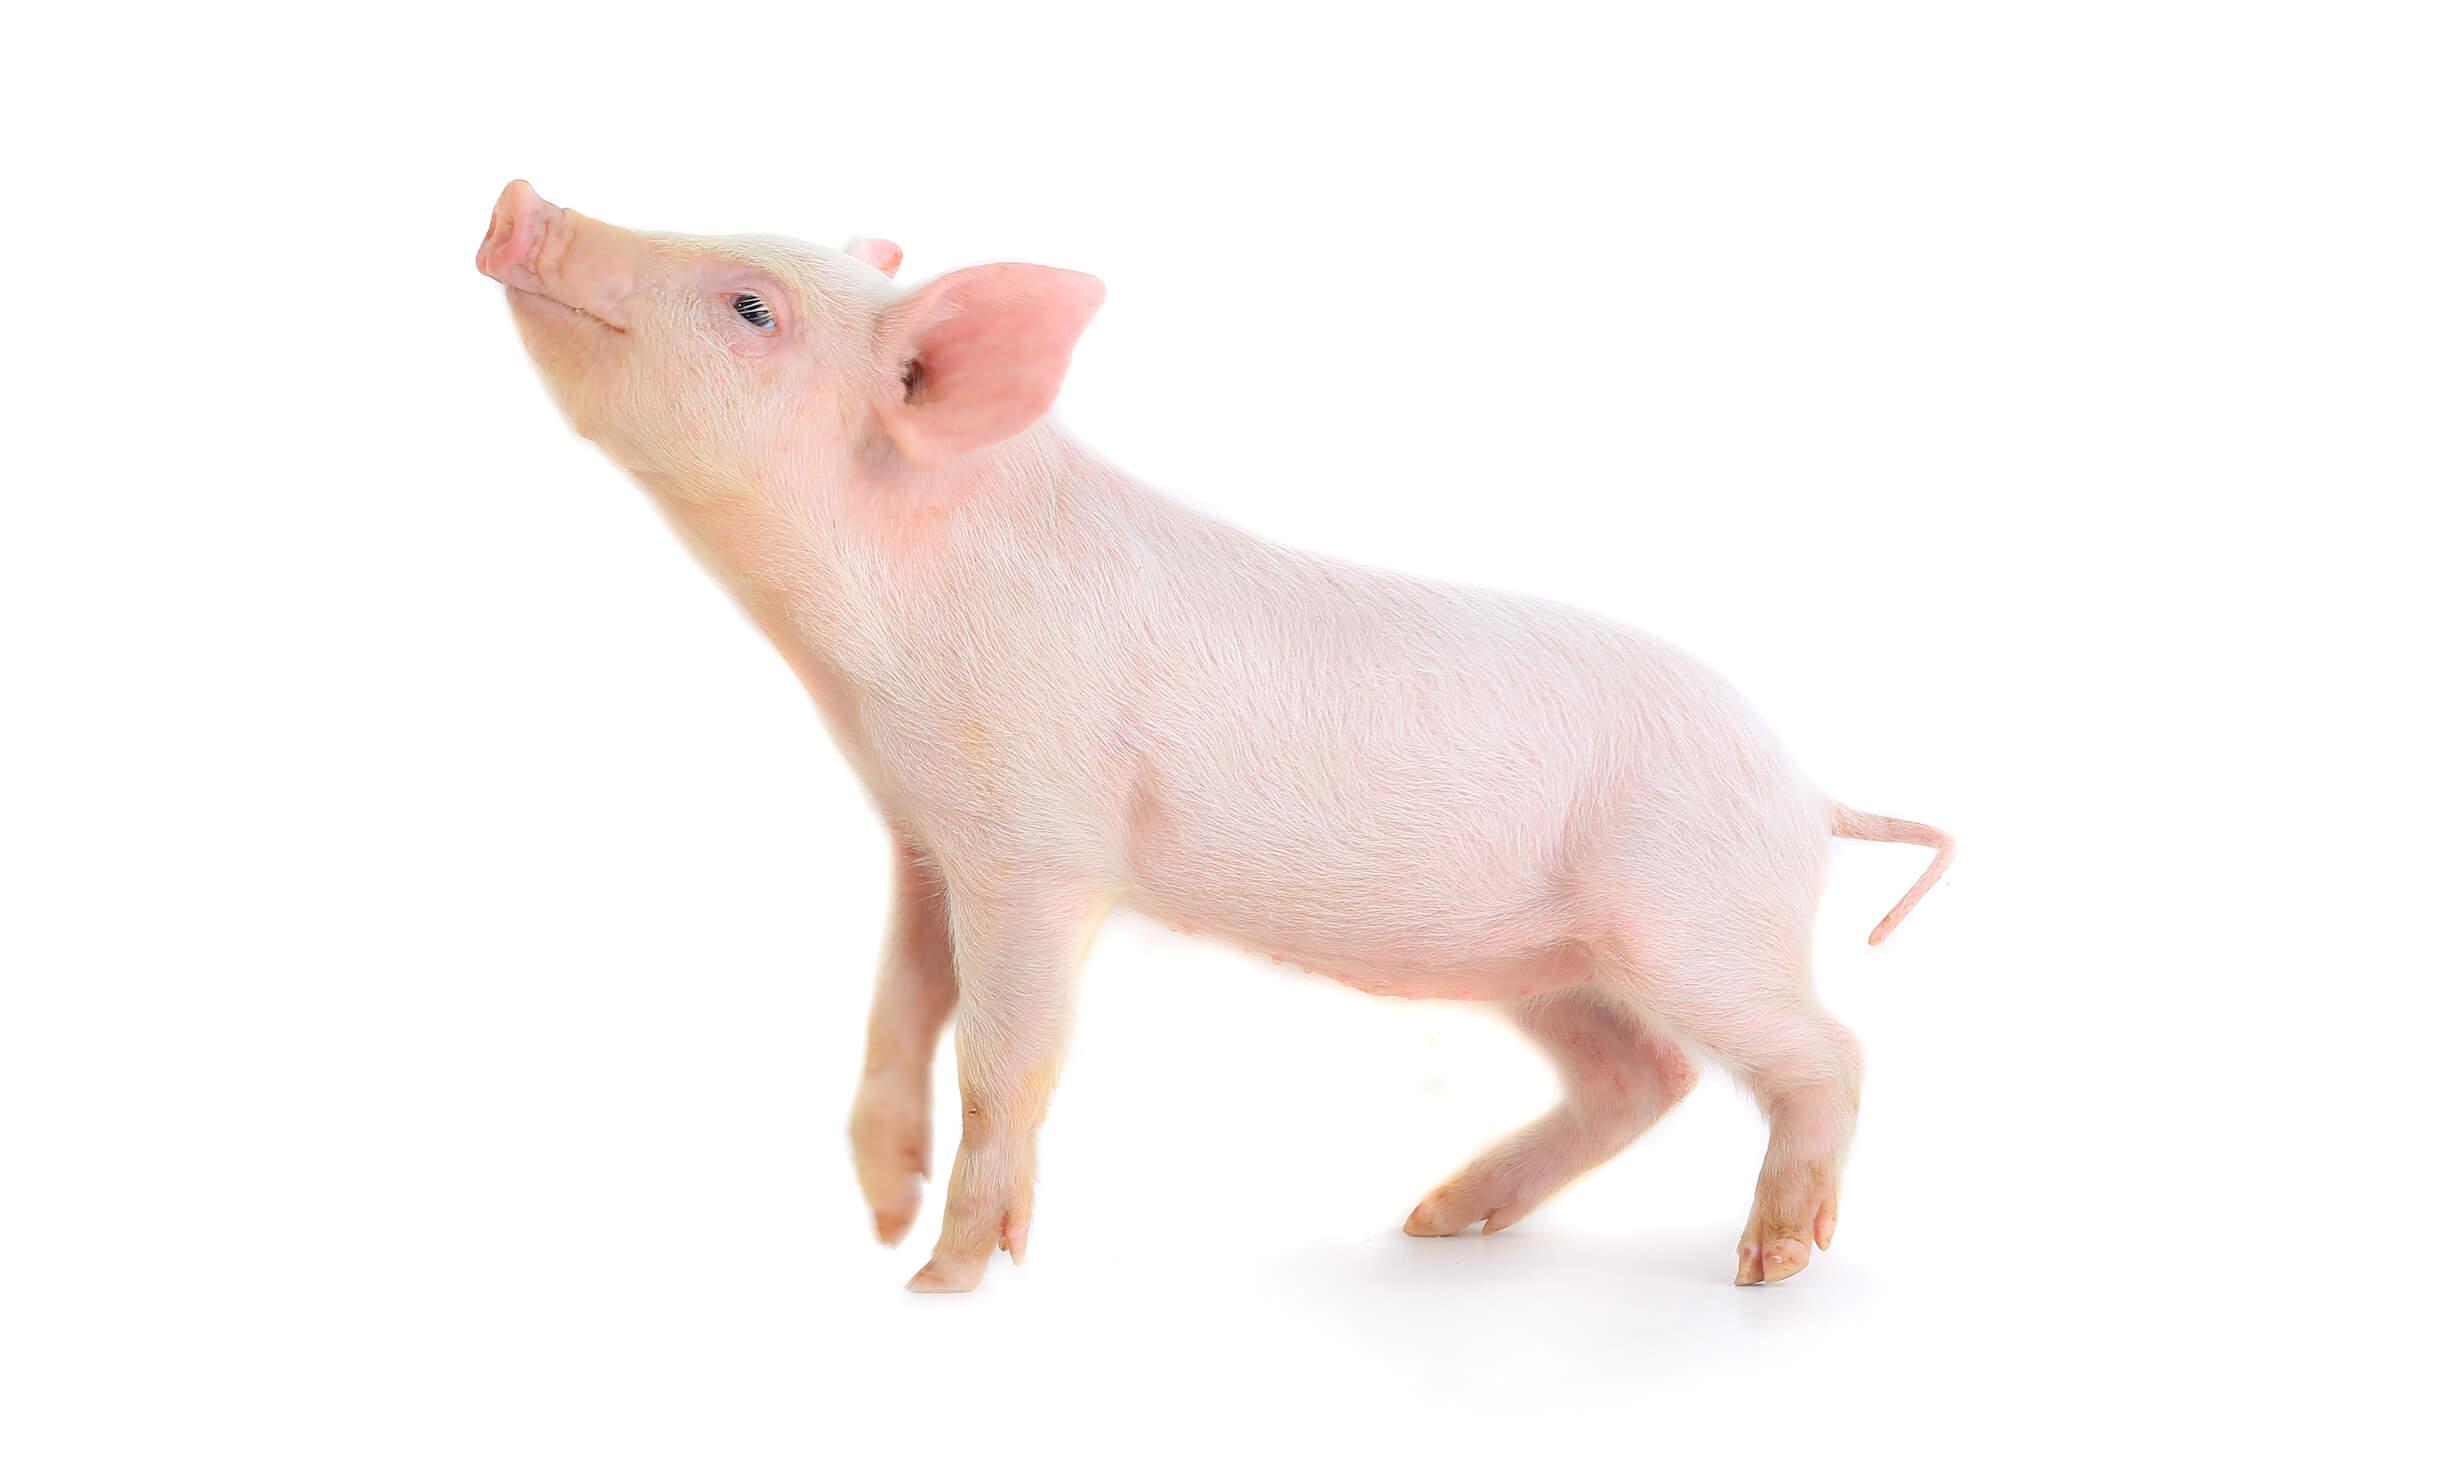 Yumax piglet